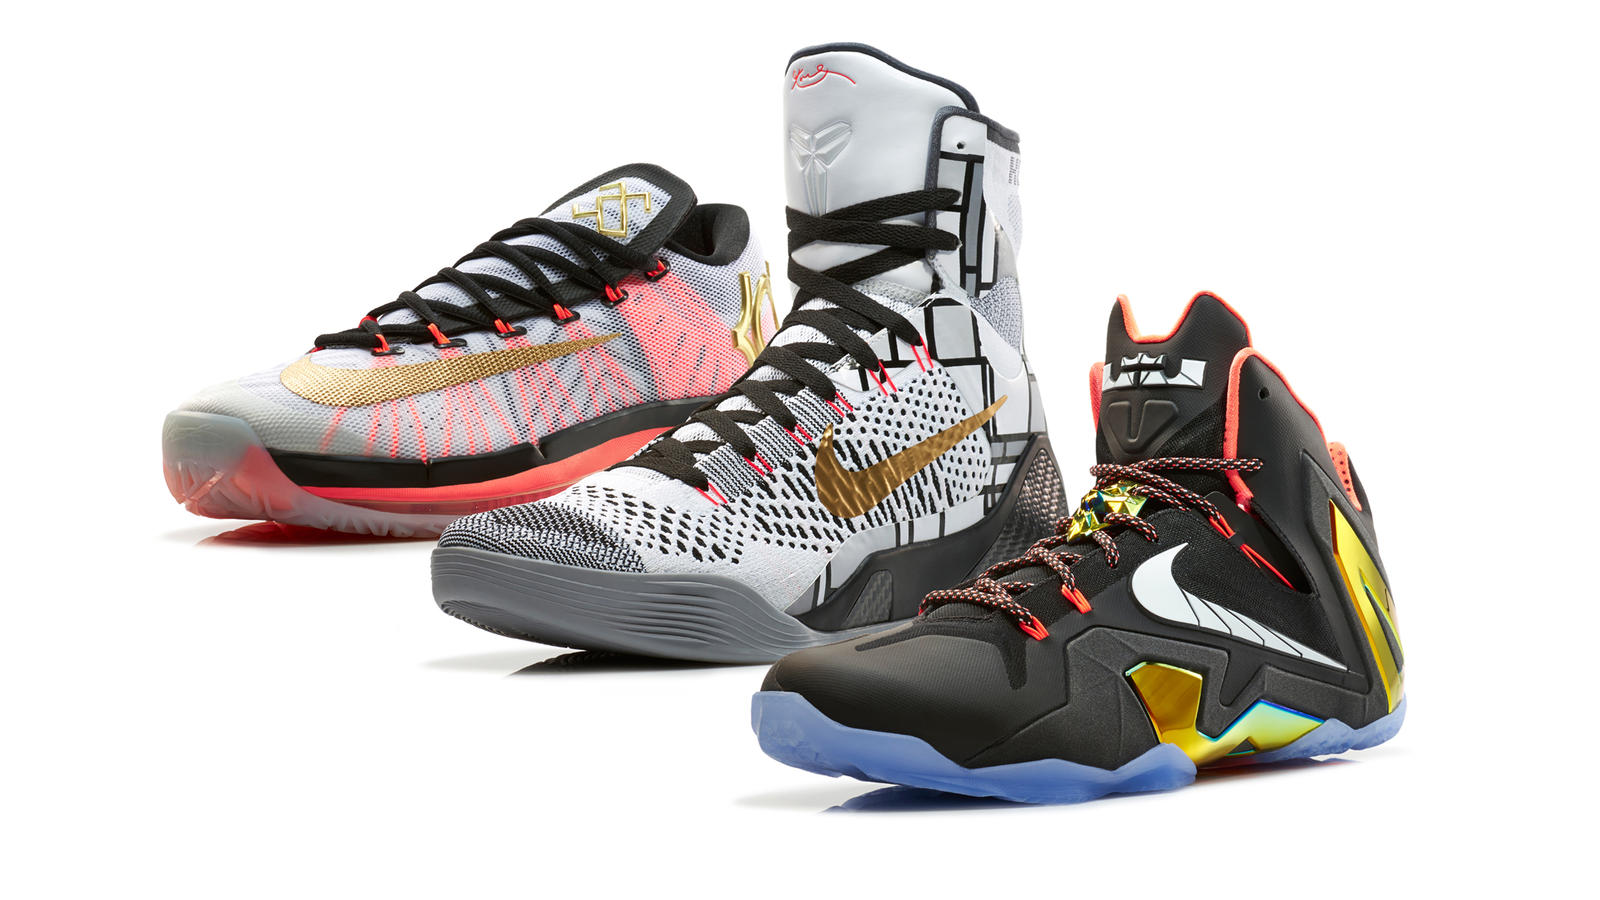 Premium Standard: Nike Basketball Elite Series Gold